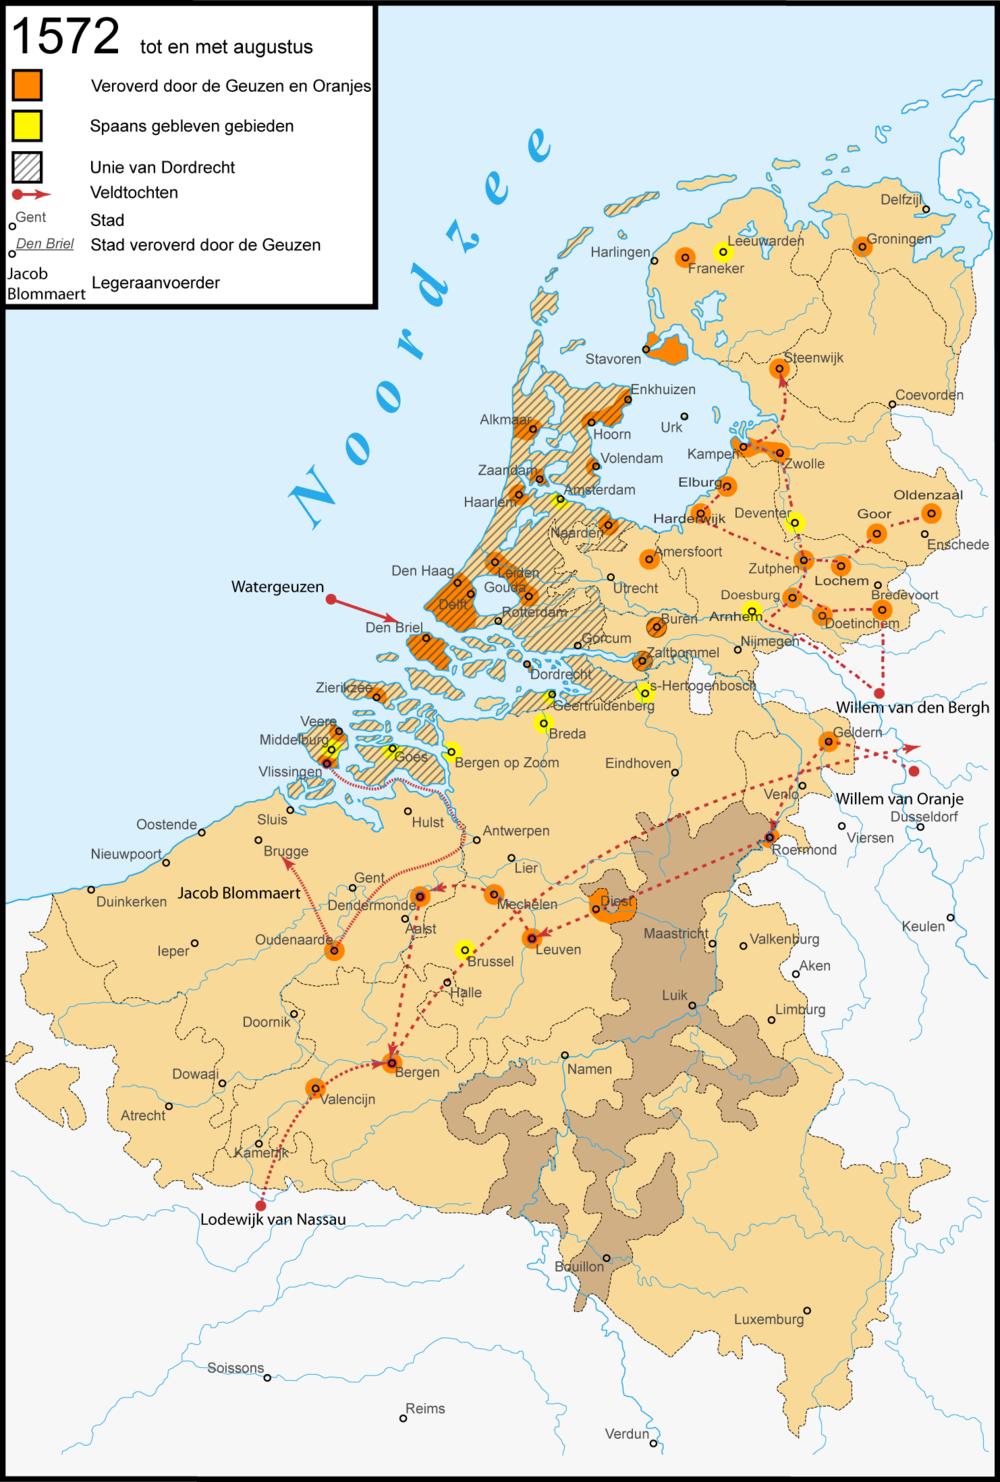 Netherlands in 1572